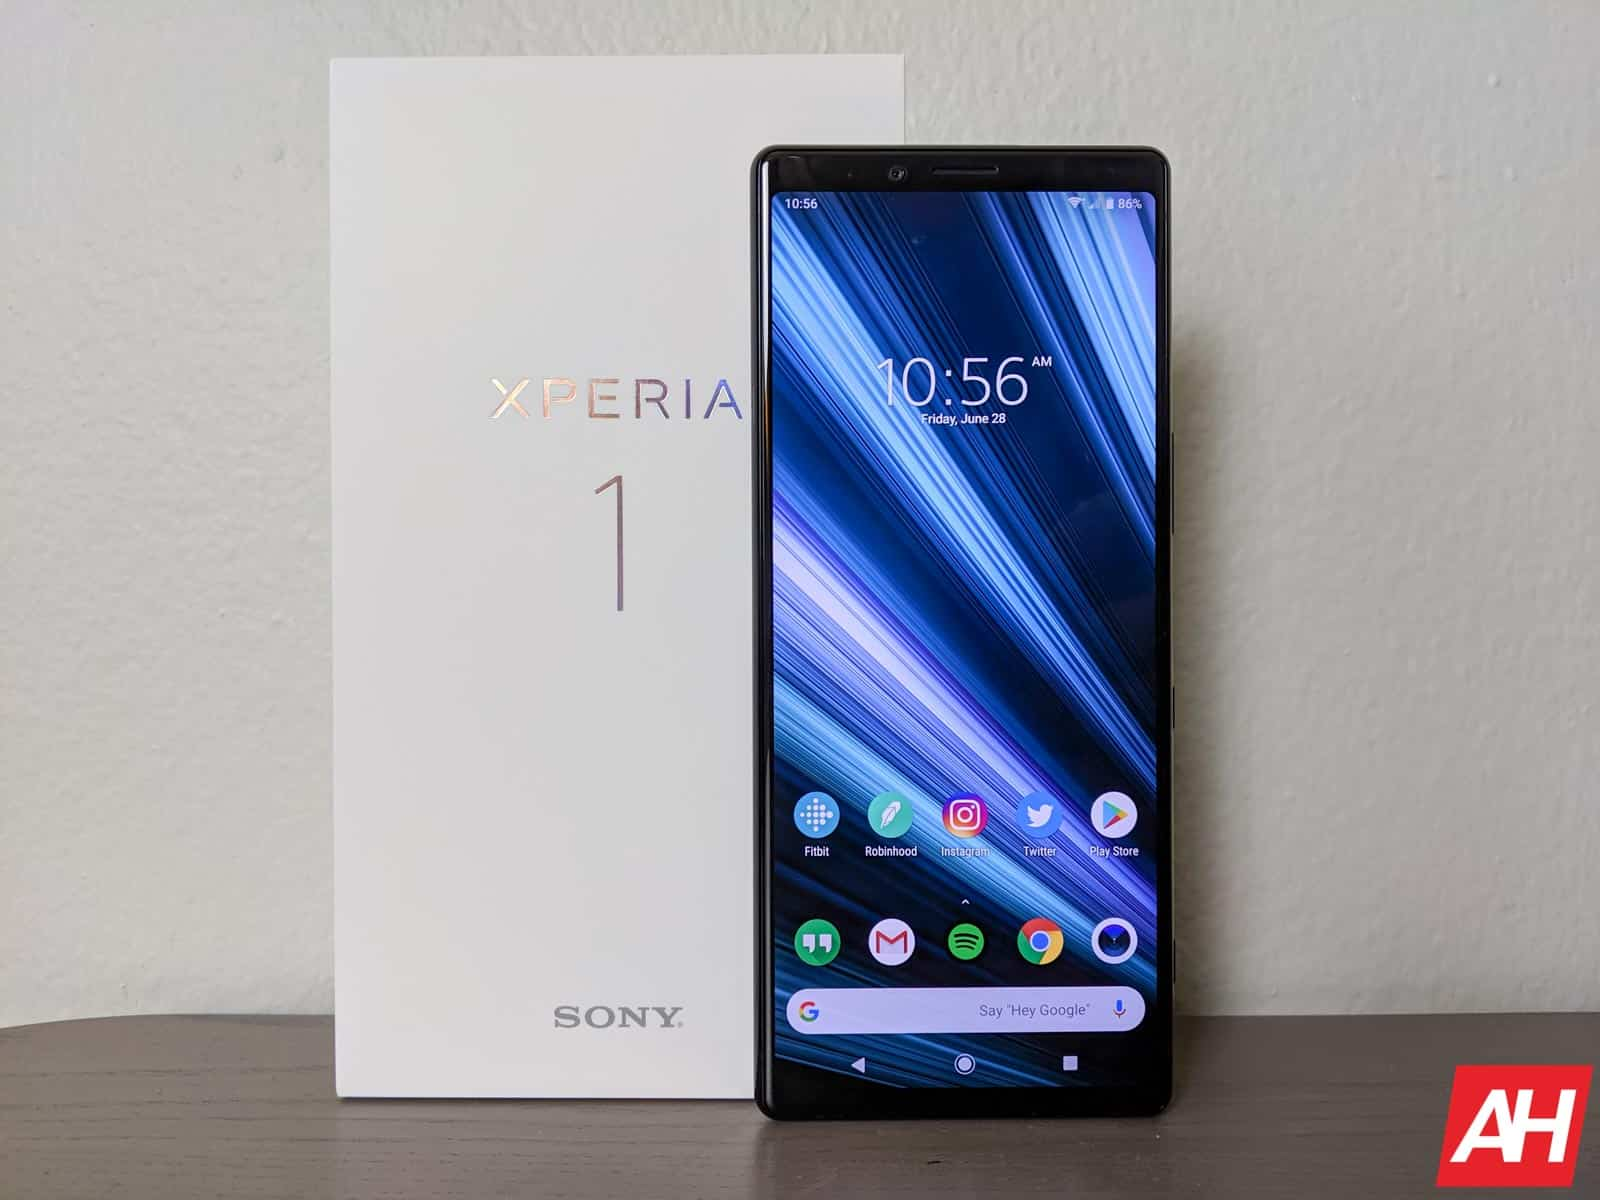 Sony Xperia 1 AM AH 1 2